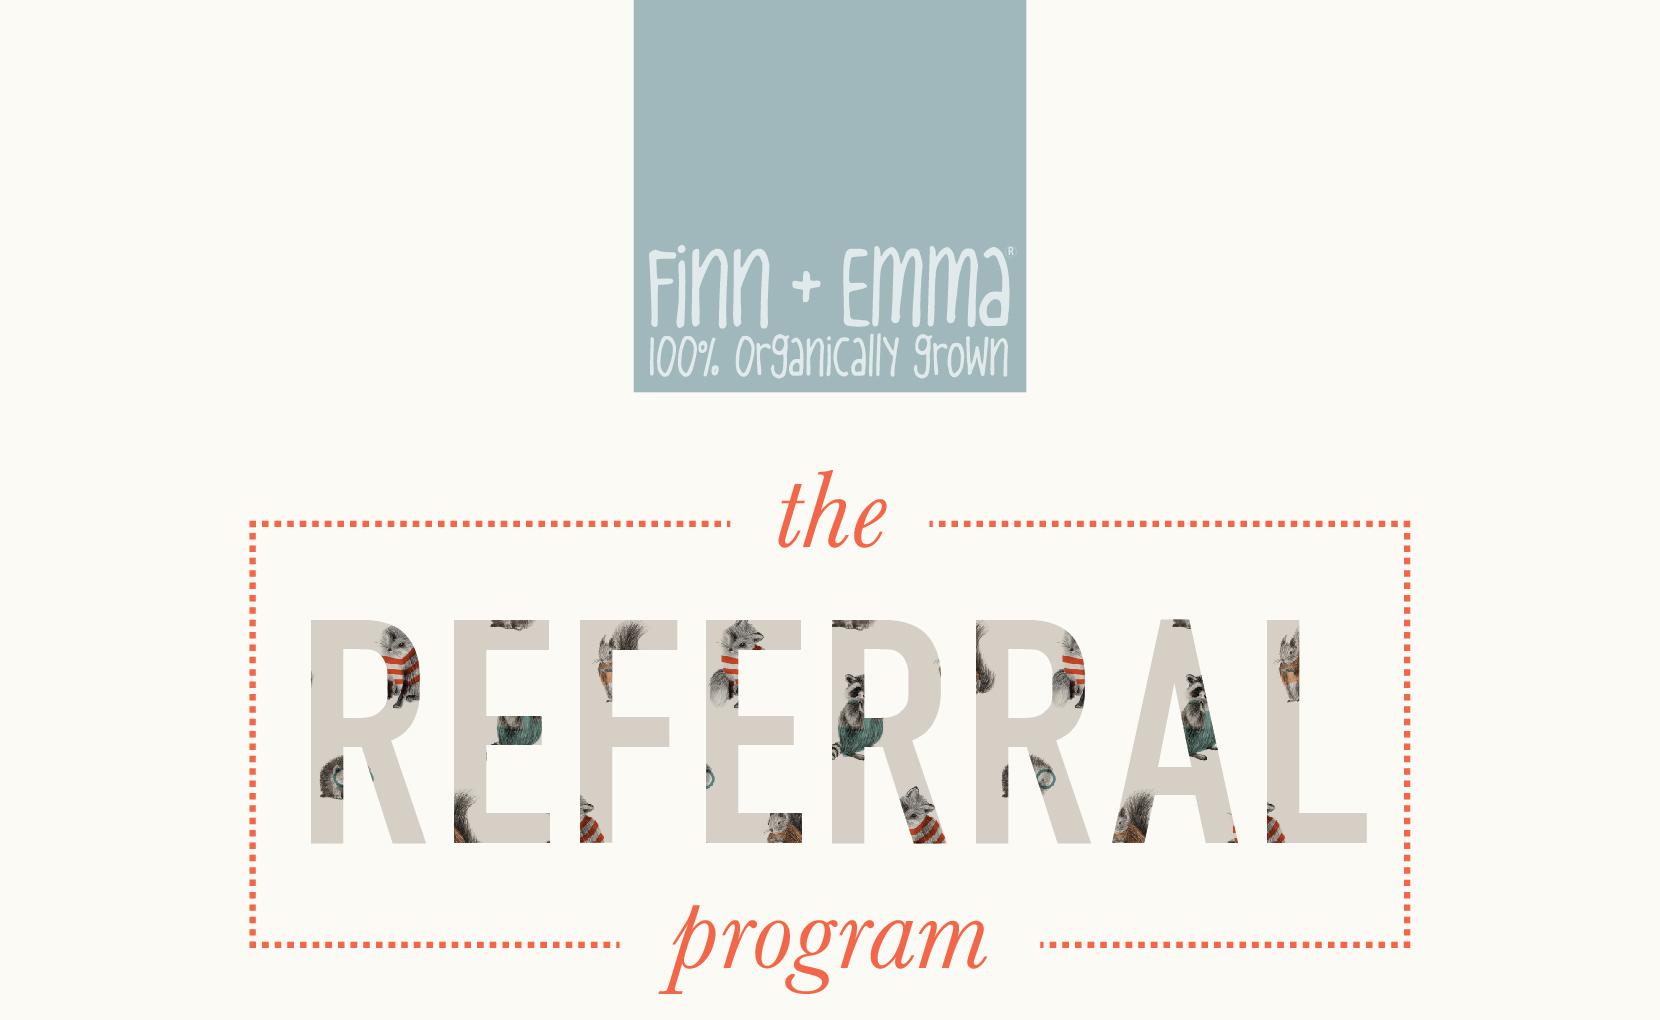 Finn + Emma Referral Program